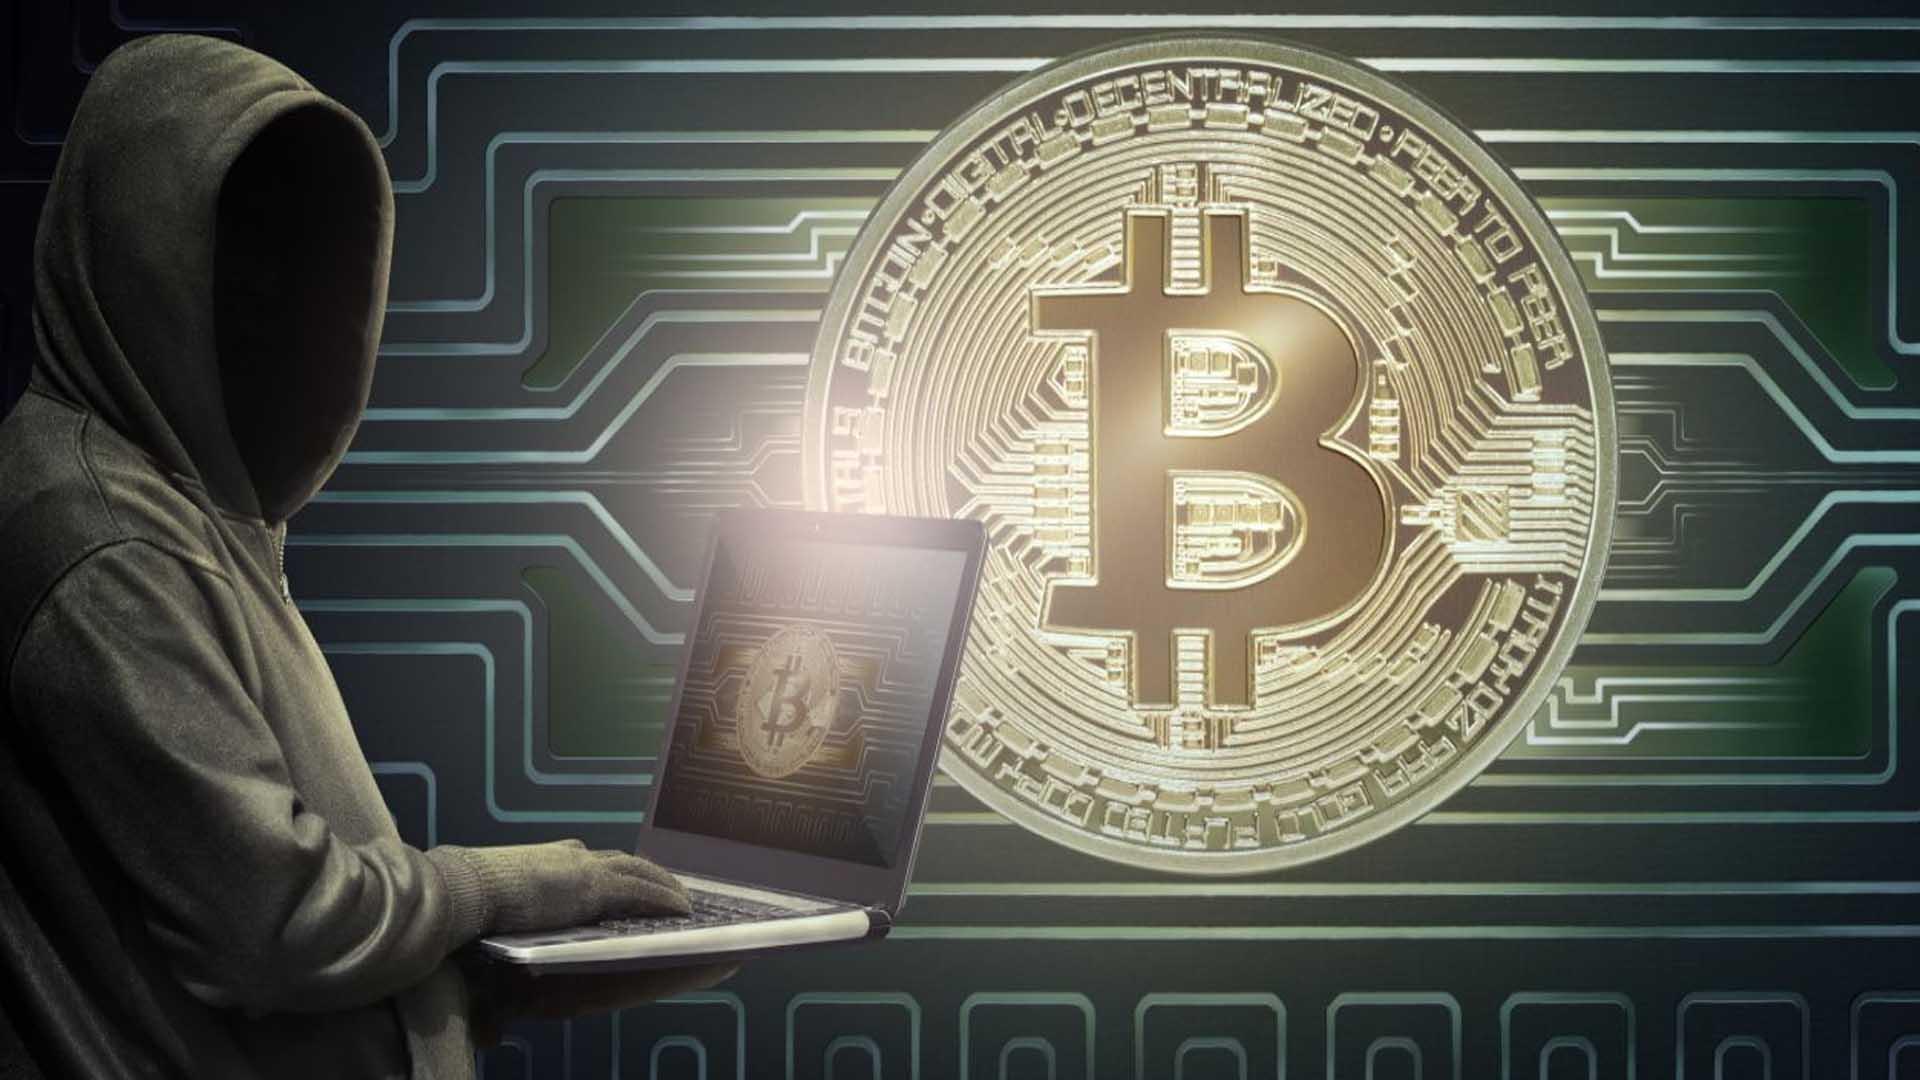 suggerimenti dan trik bitcoin di trading zebpay bitcoin india